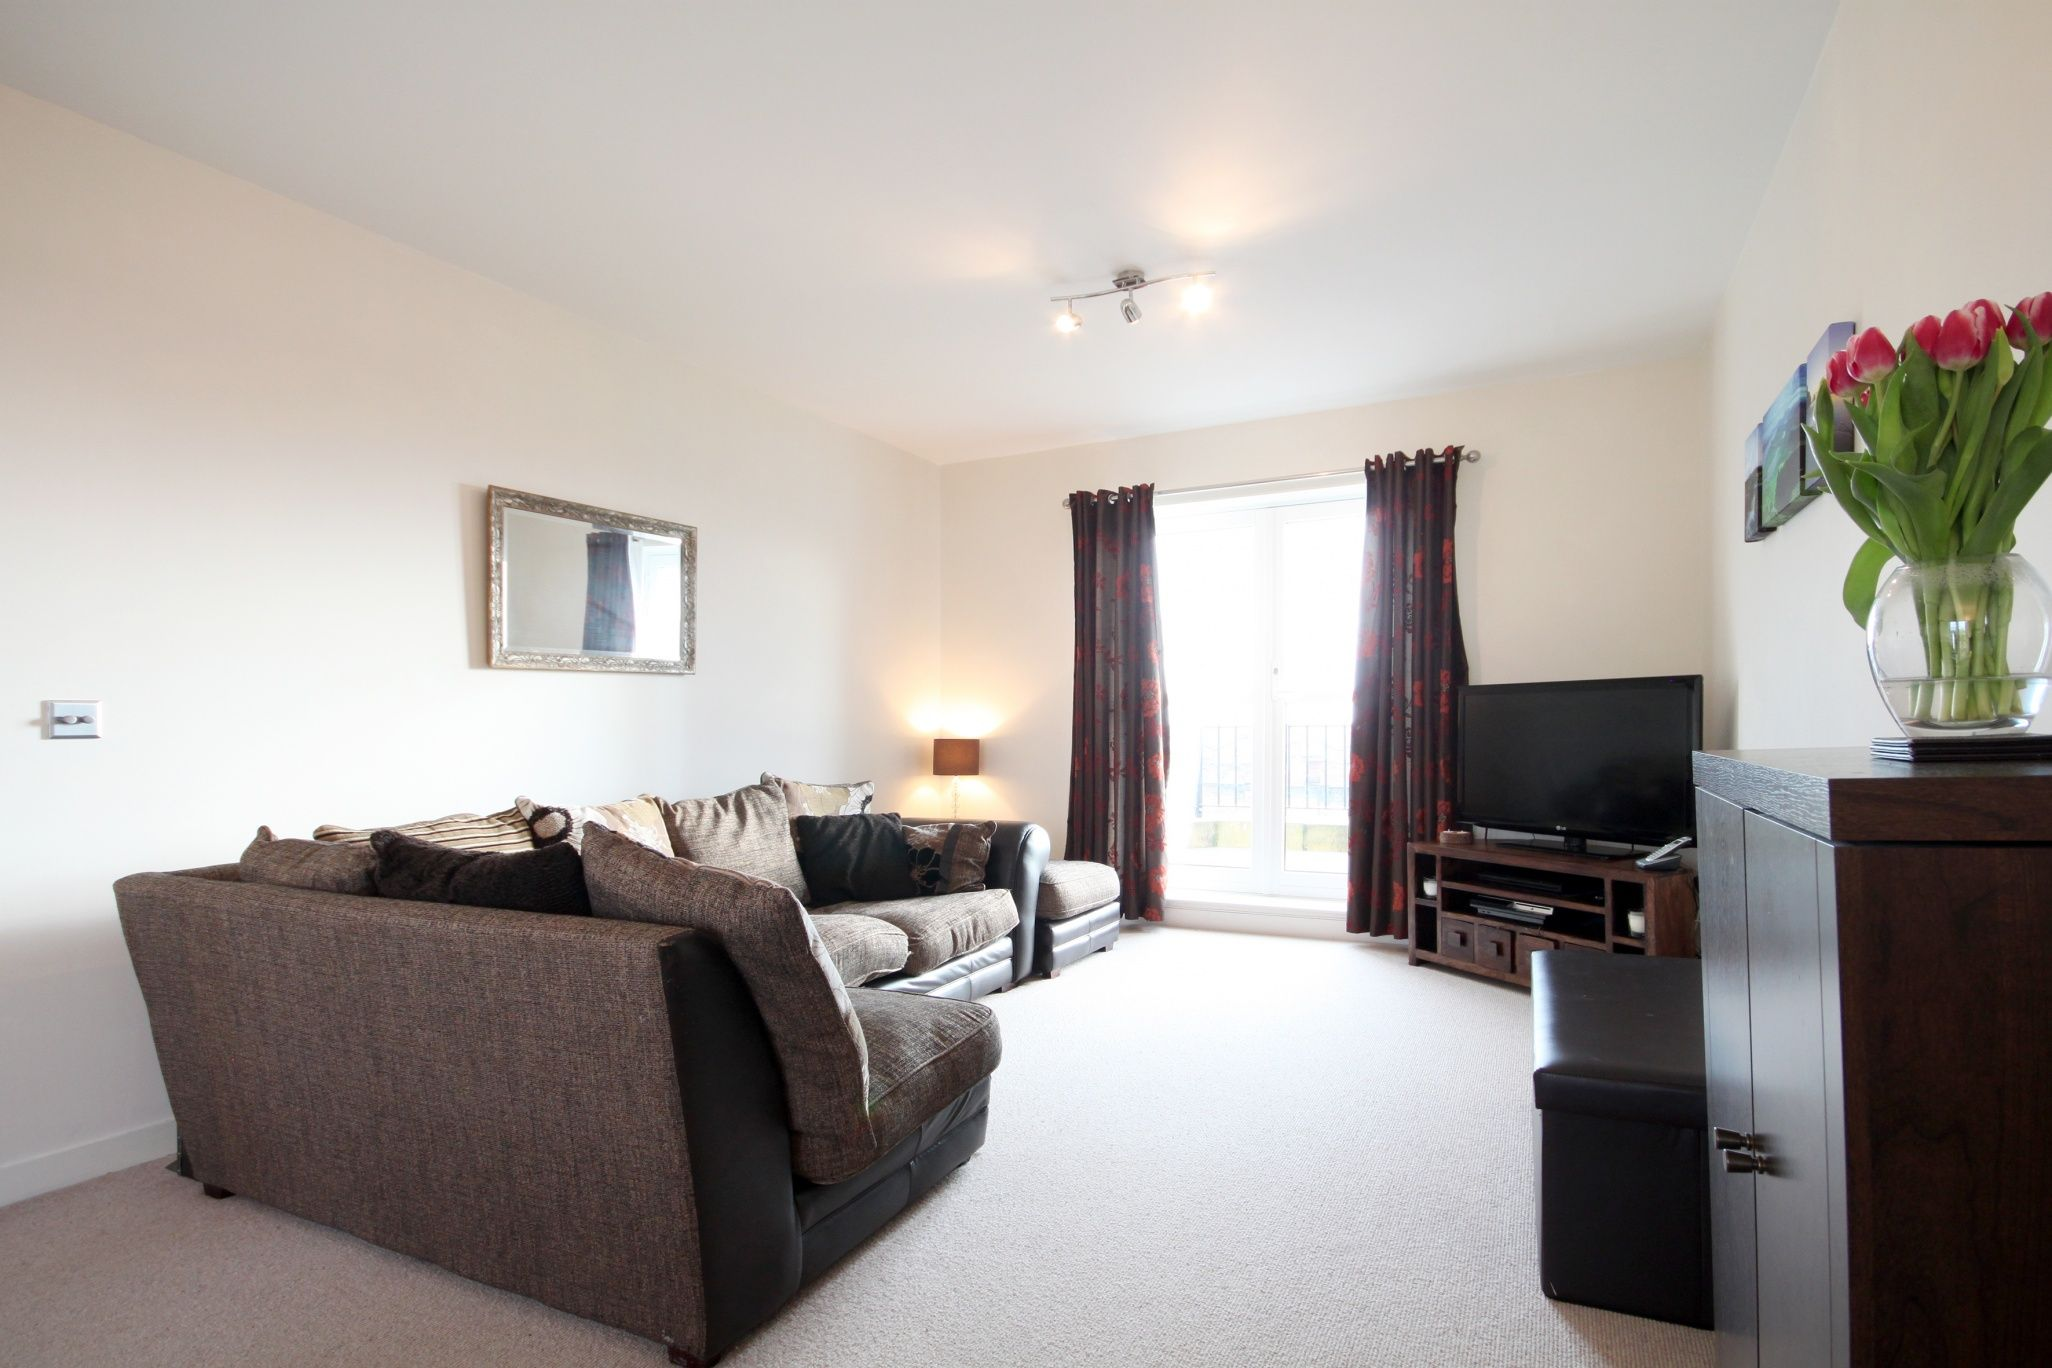 Edinburgh Two Bedroom Apartments 2 Bed Flat Living Room